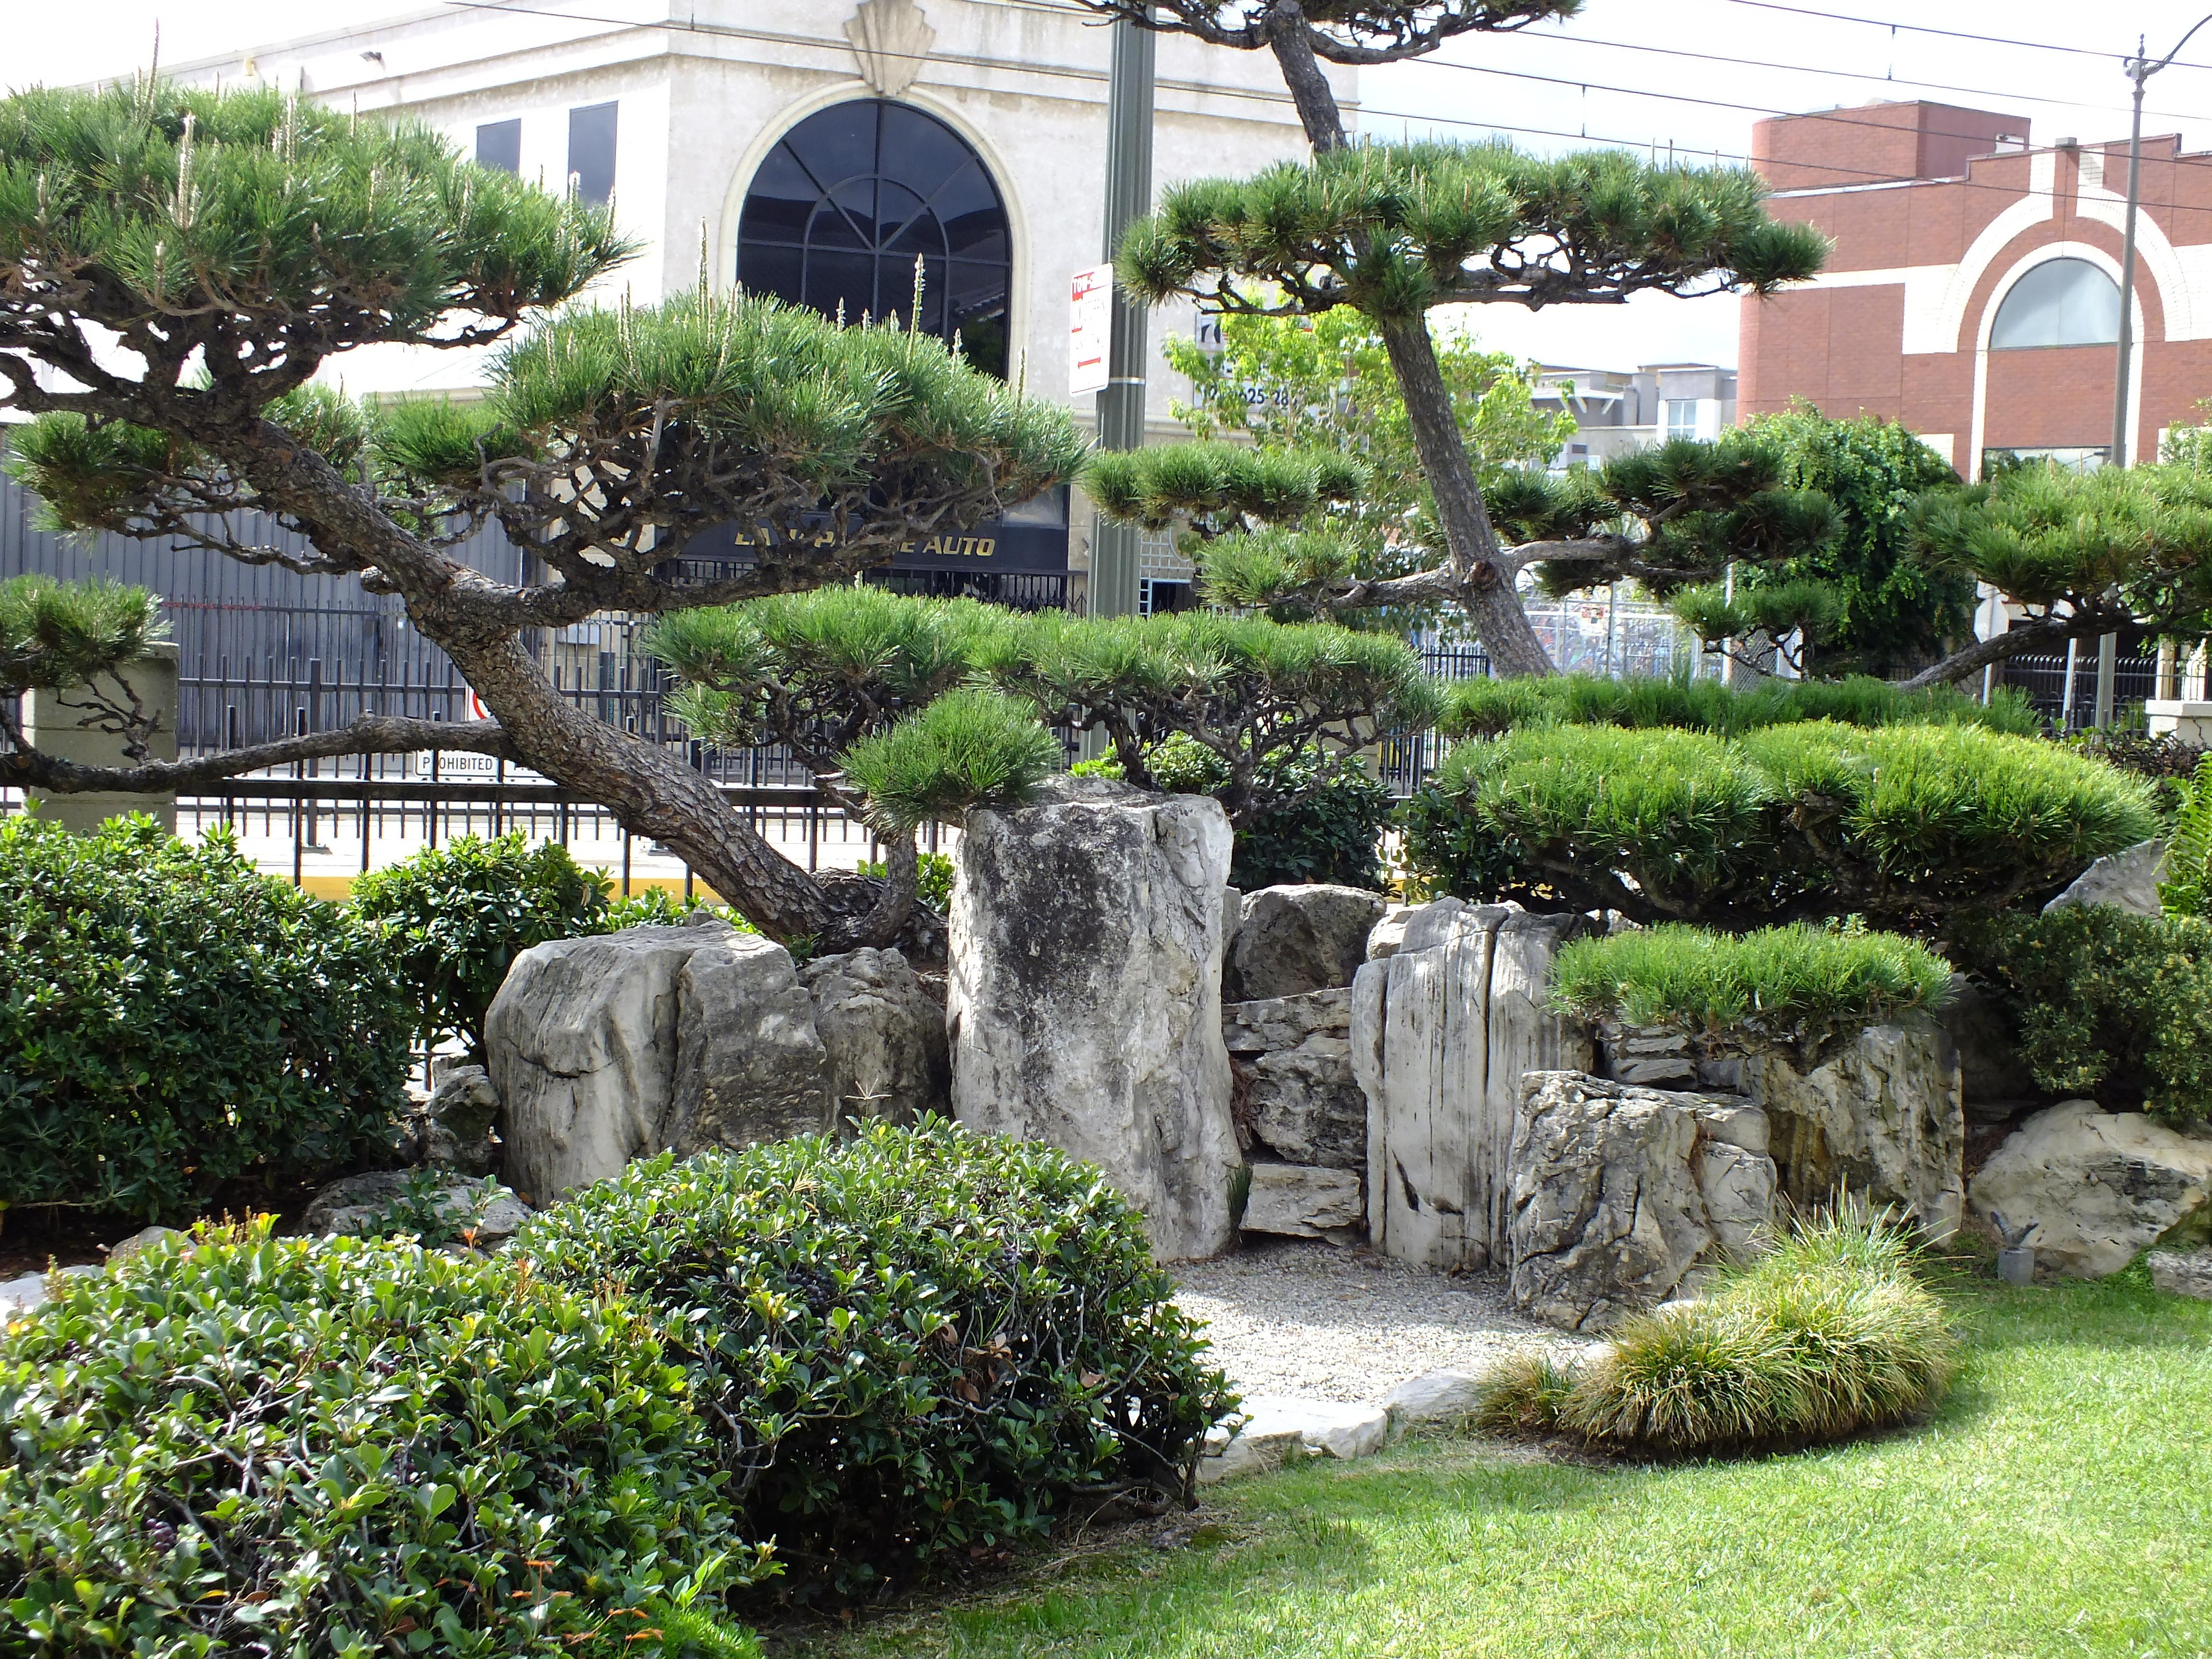 Los Angeles Japanese Garden: Short Walk In Los Angeles Yields Several Gardens